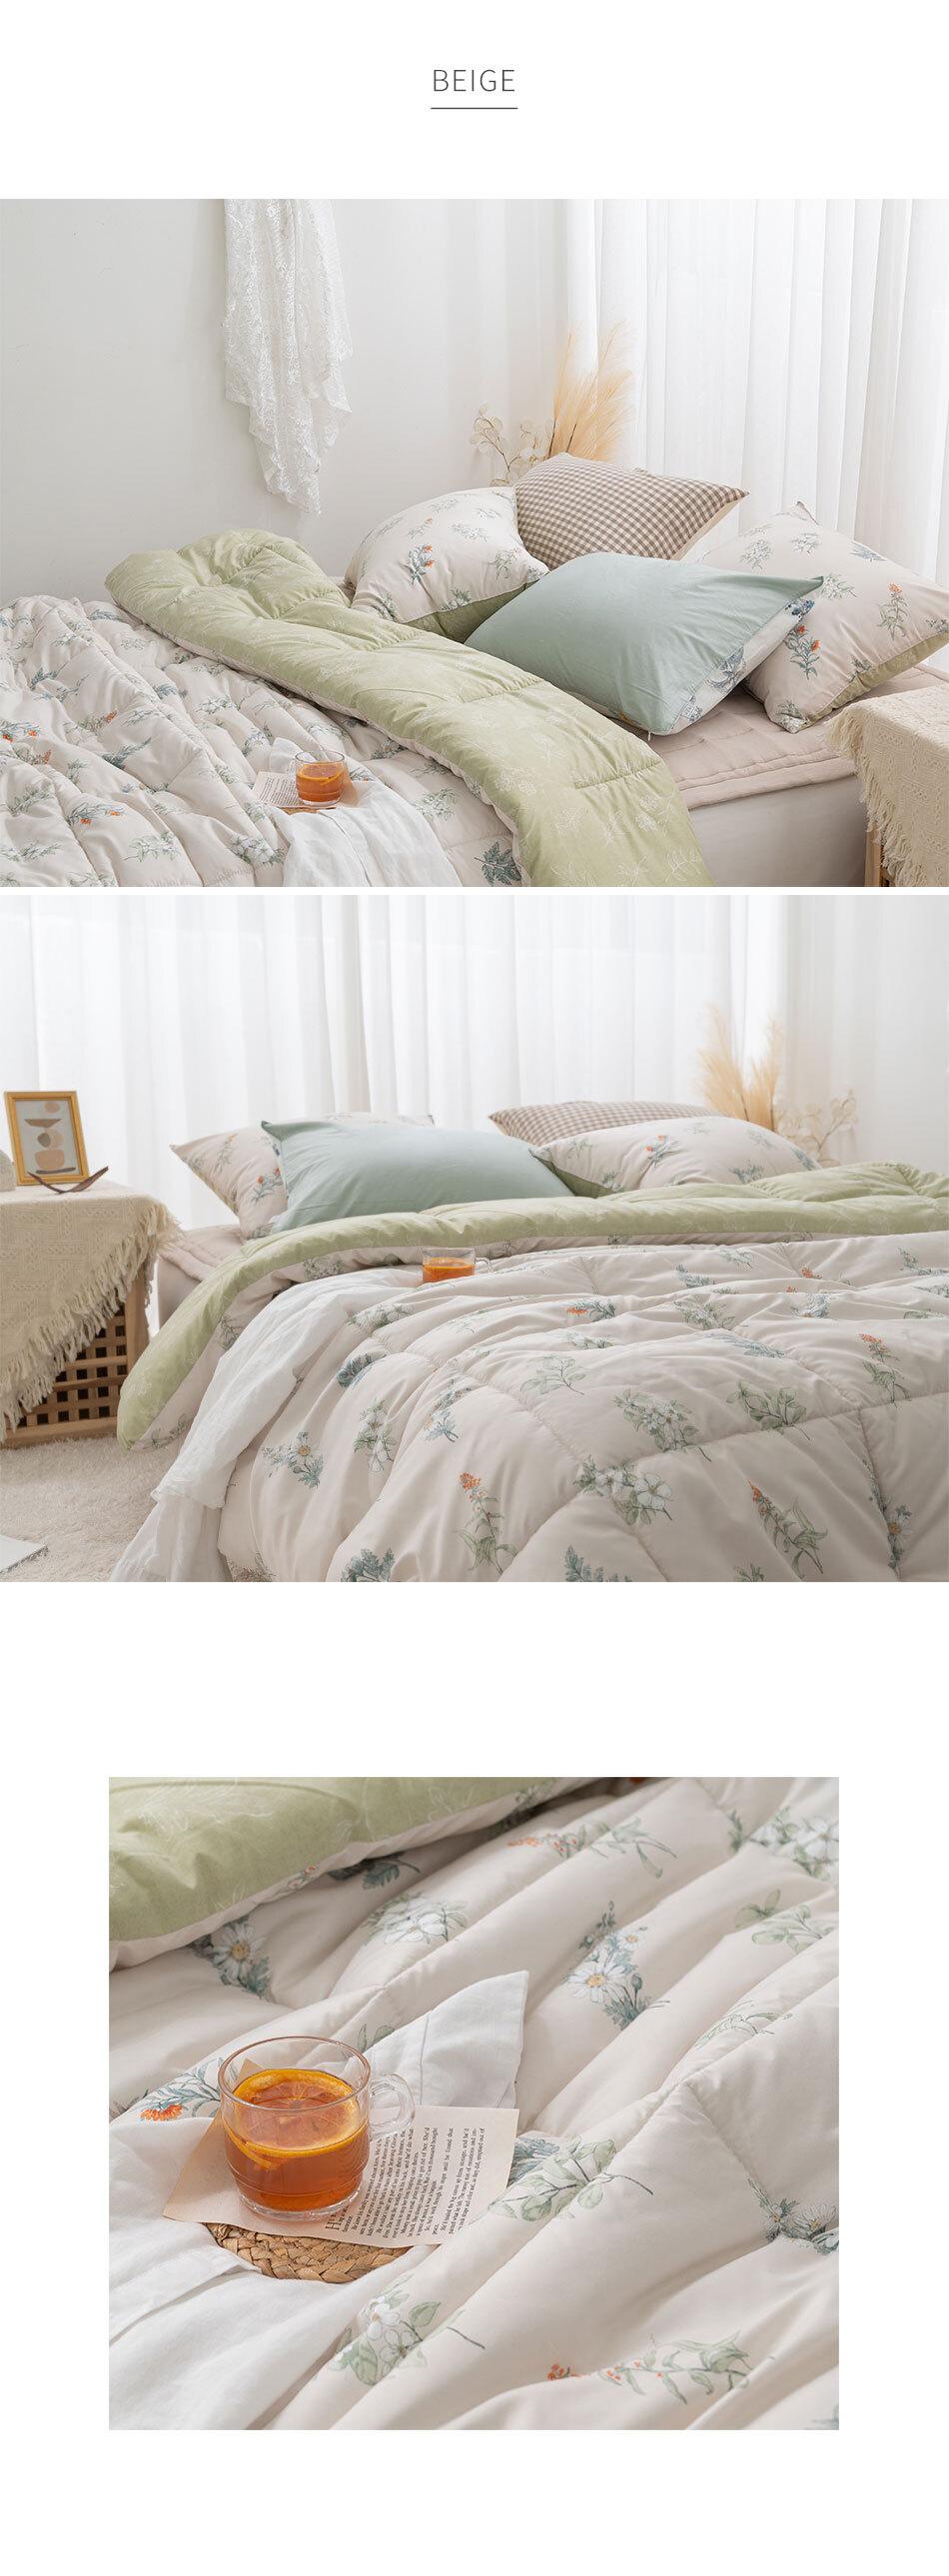 mellow_bed_beige_01.jpg